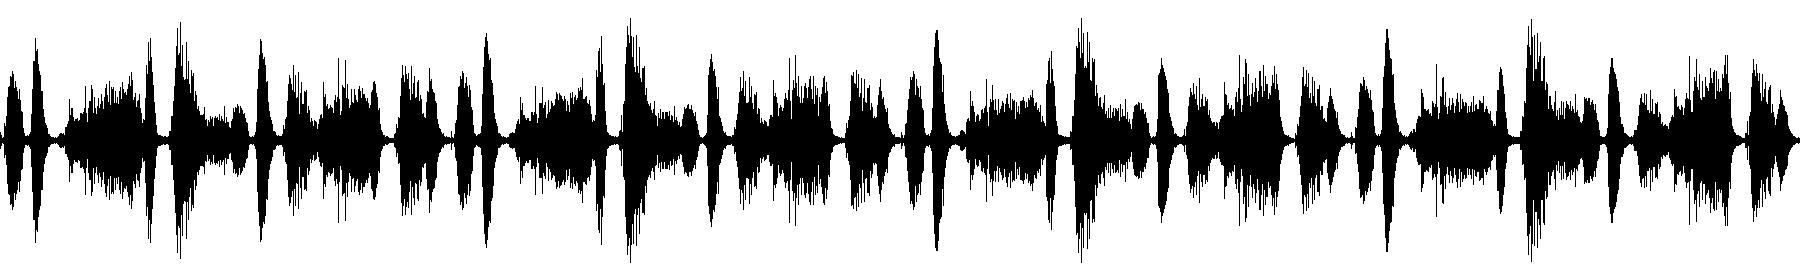 ehu liveperc125 006